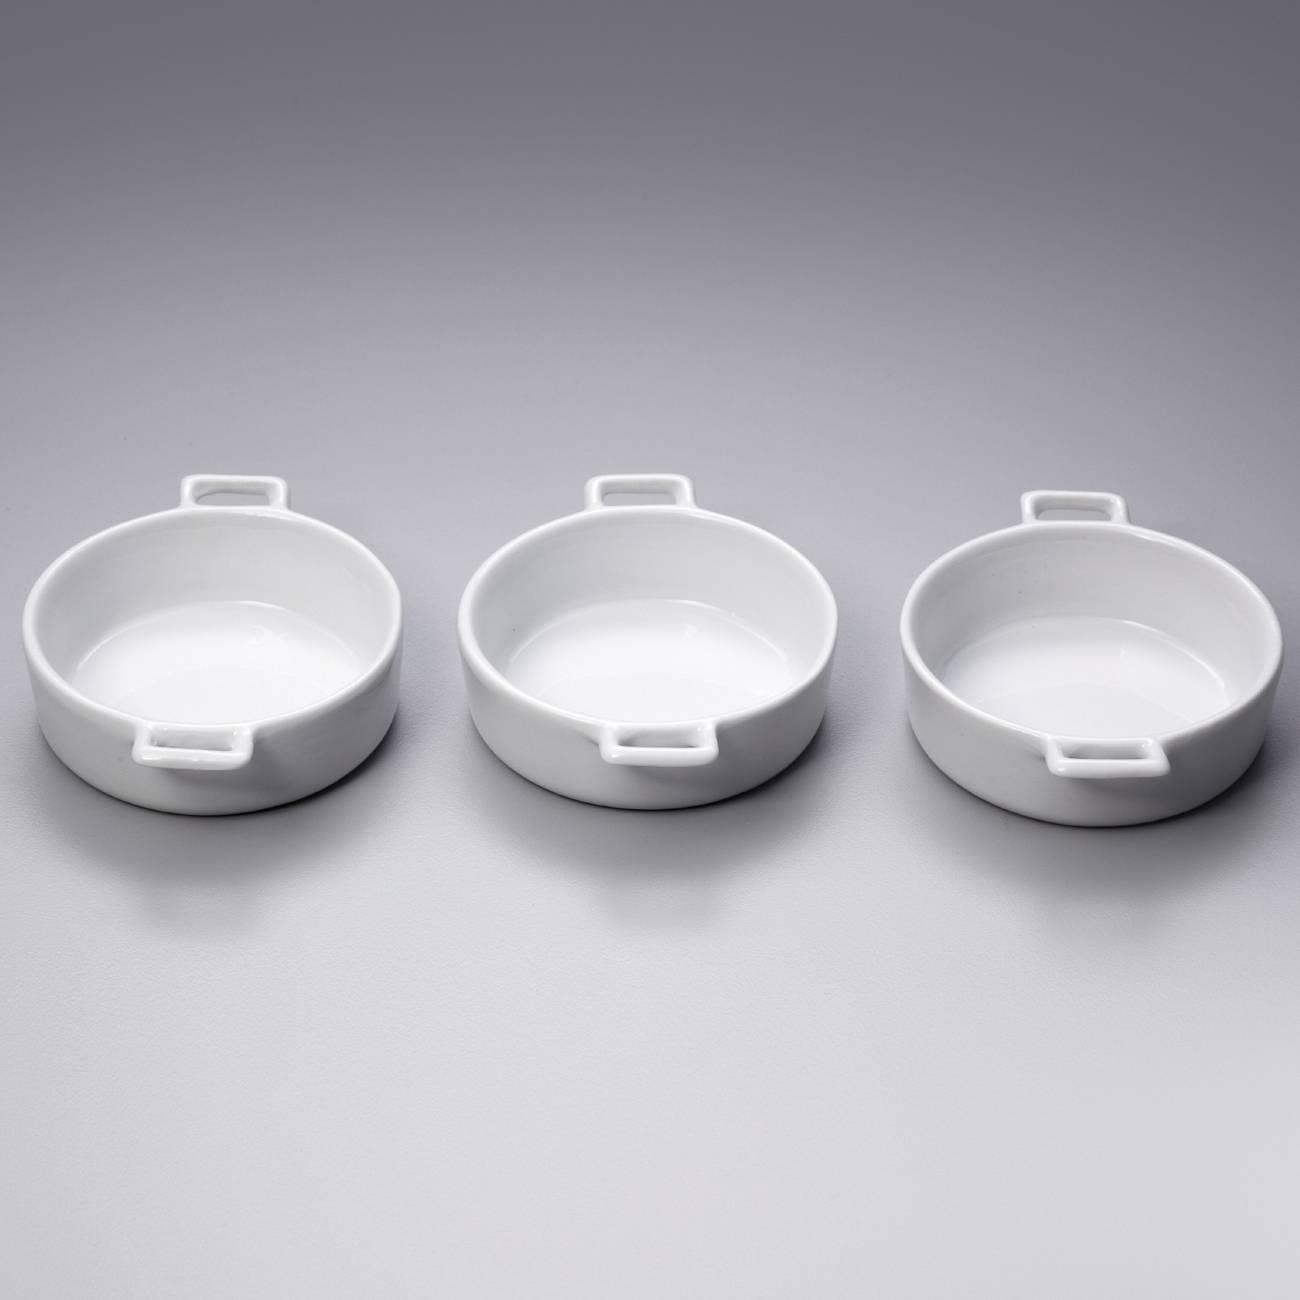 Conjunto 3 Petisqueiras Brancas c/ Alça - Bon Gourmet - 11,4x9 cm